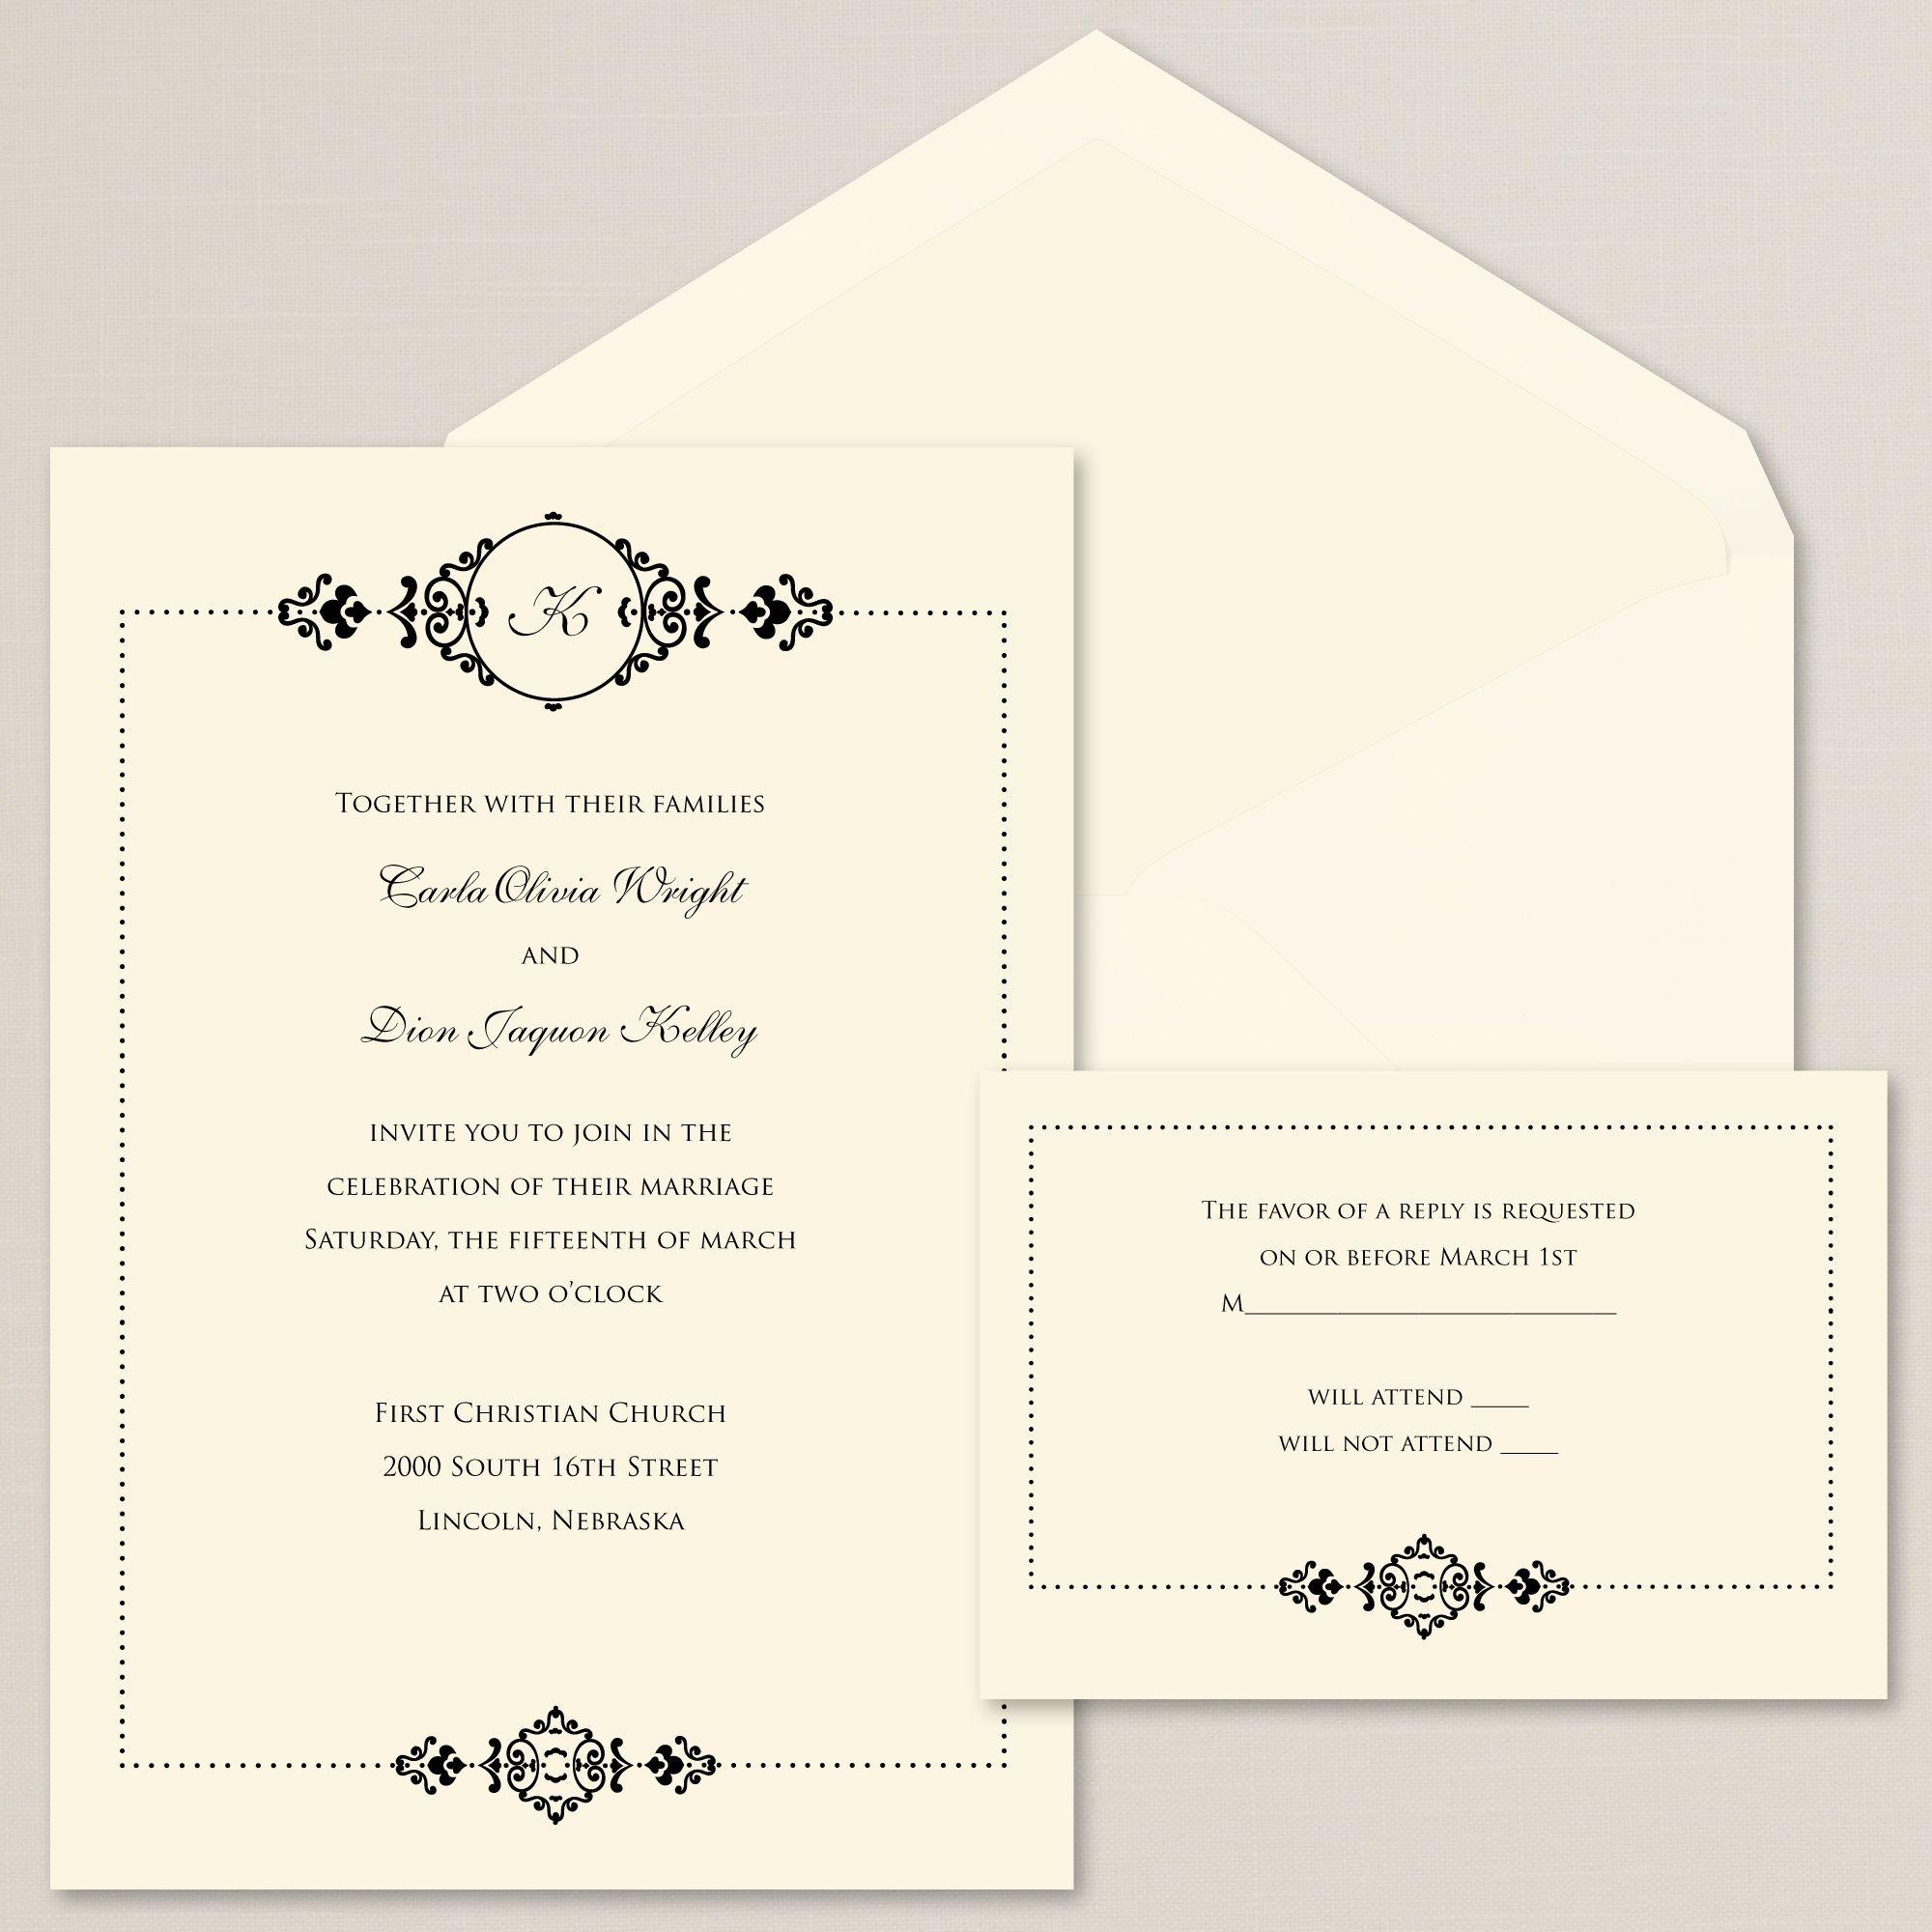 Lovely Elegance Wedding Invitation | Weddings, Exclusively weddings ...